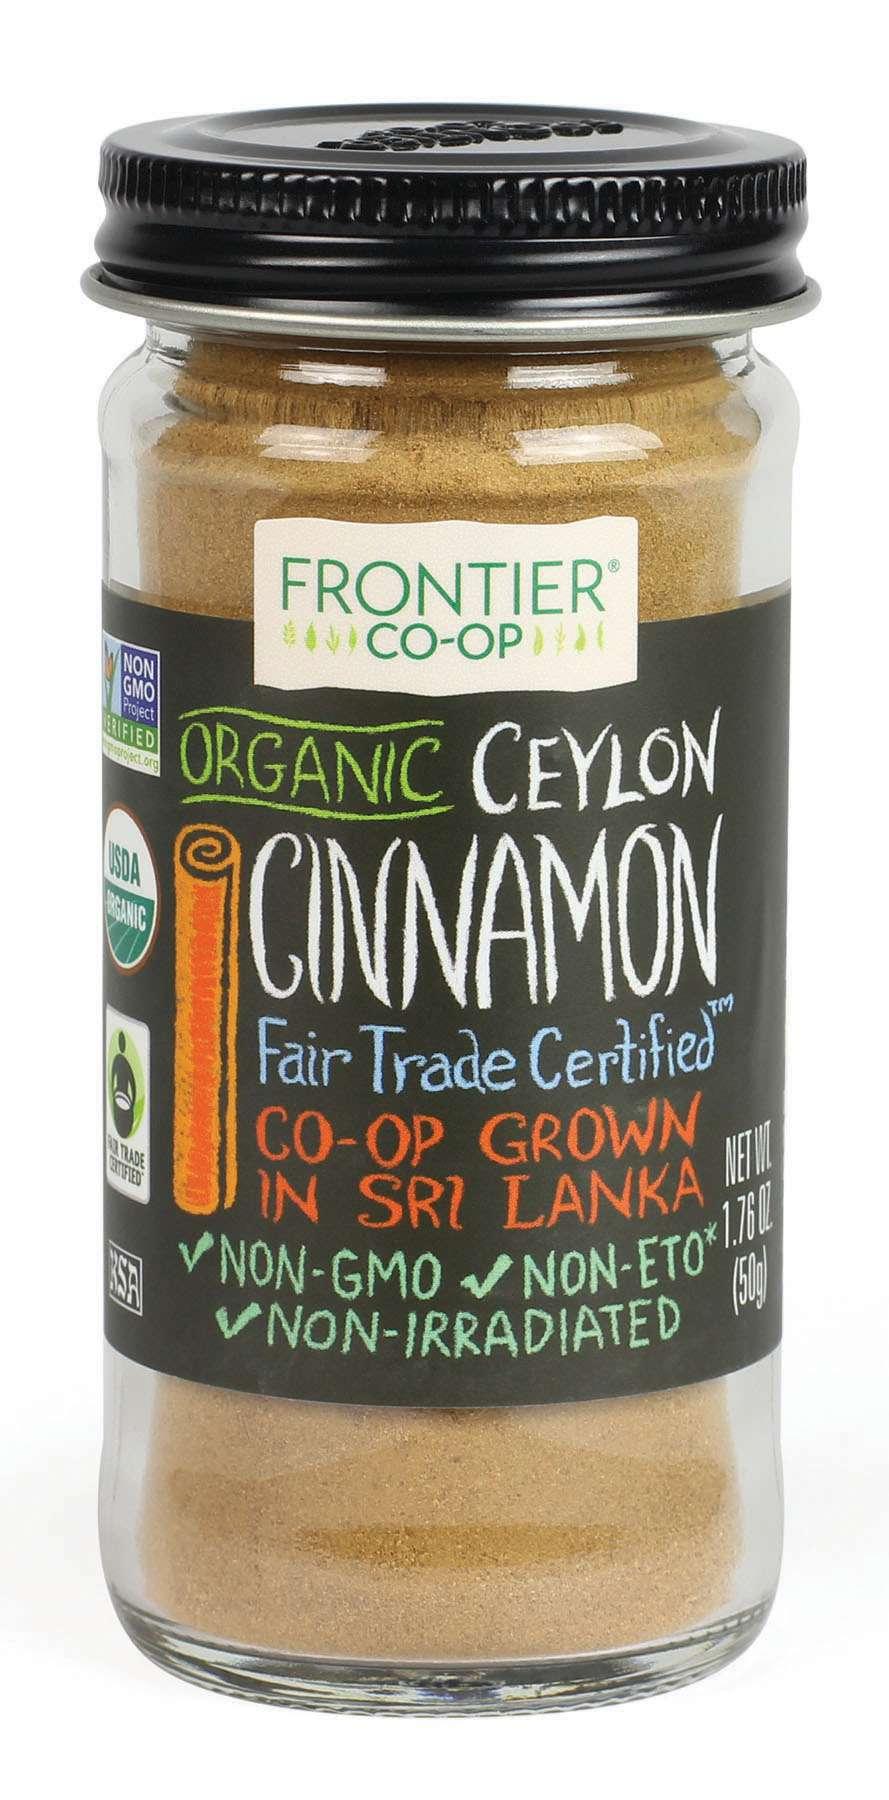 The 9 Best Cinnamons of 2020